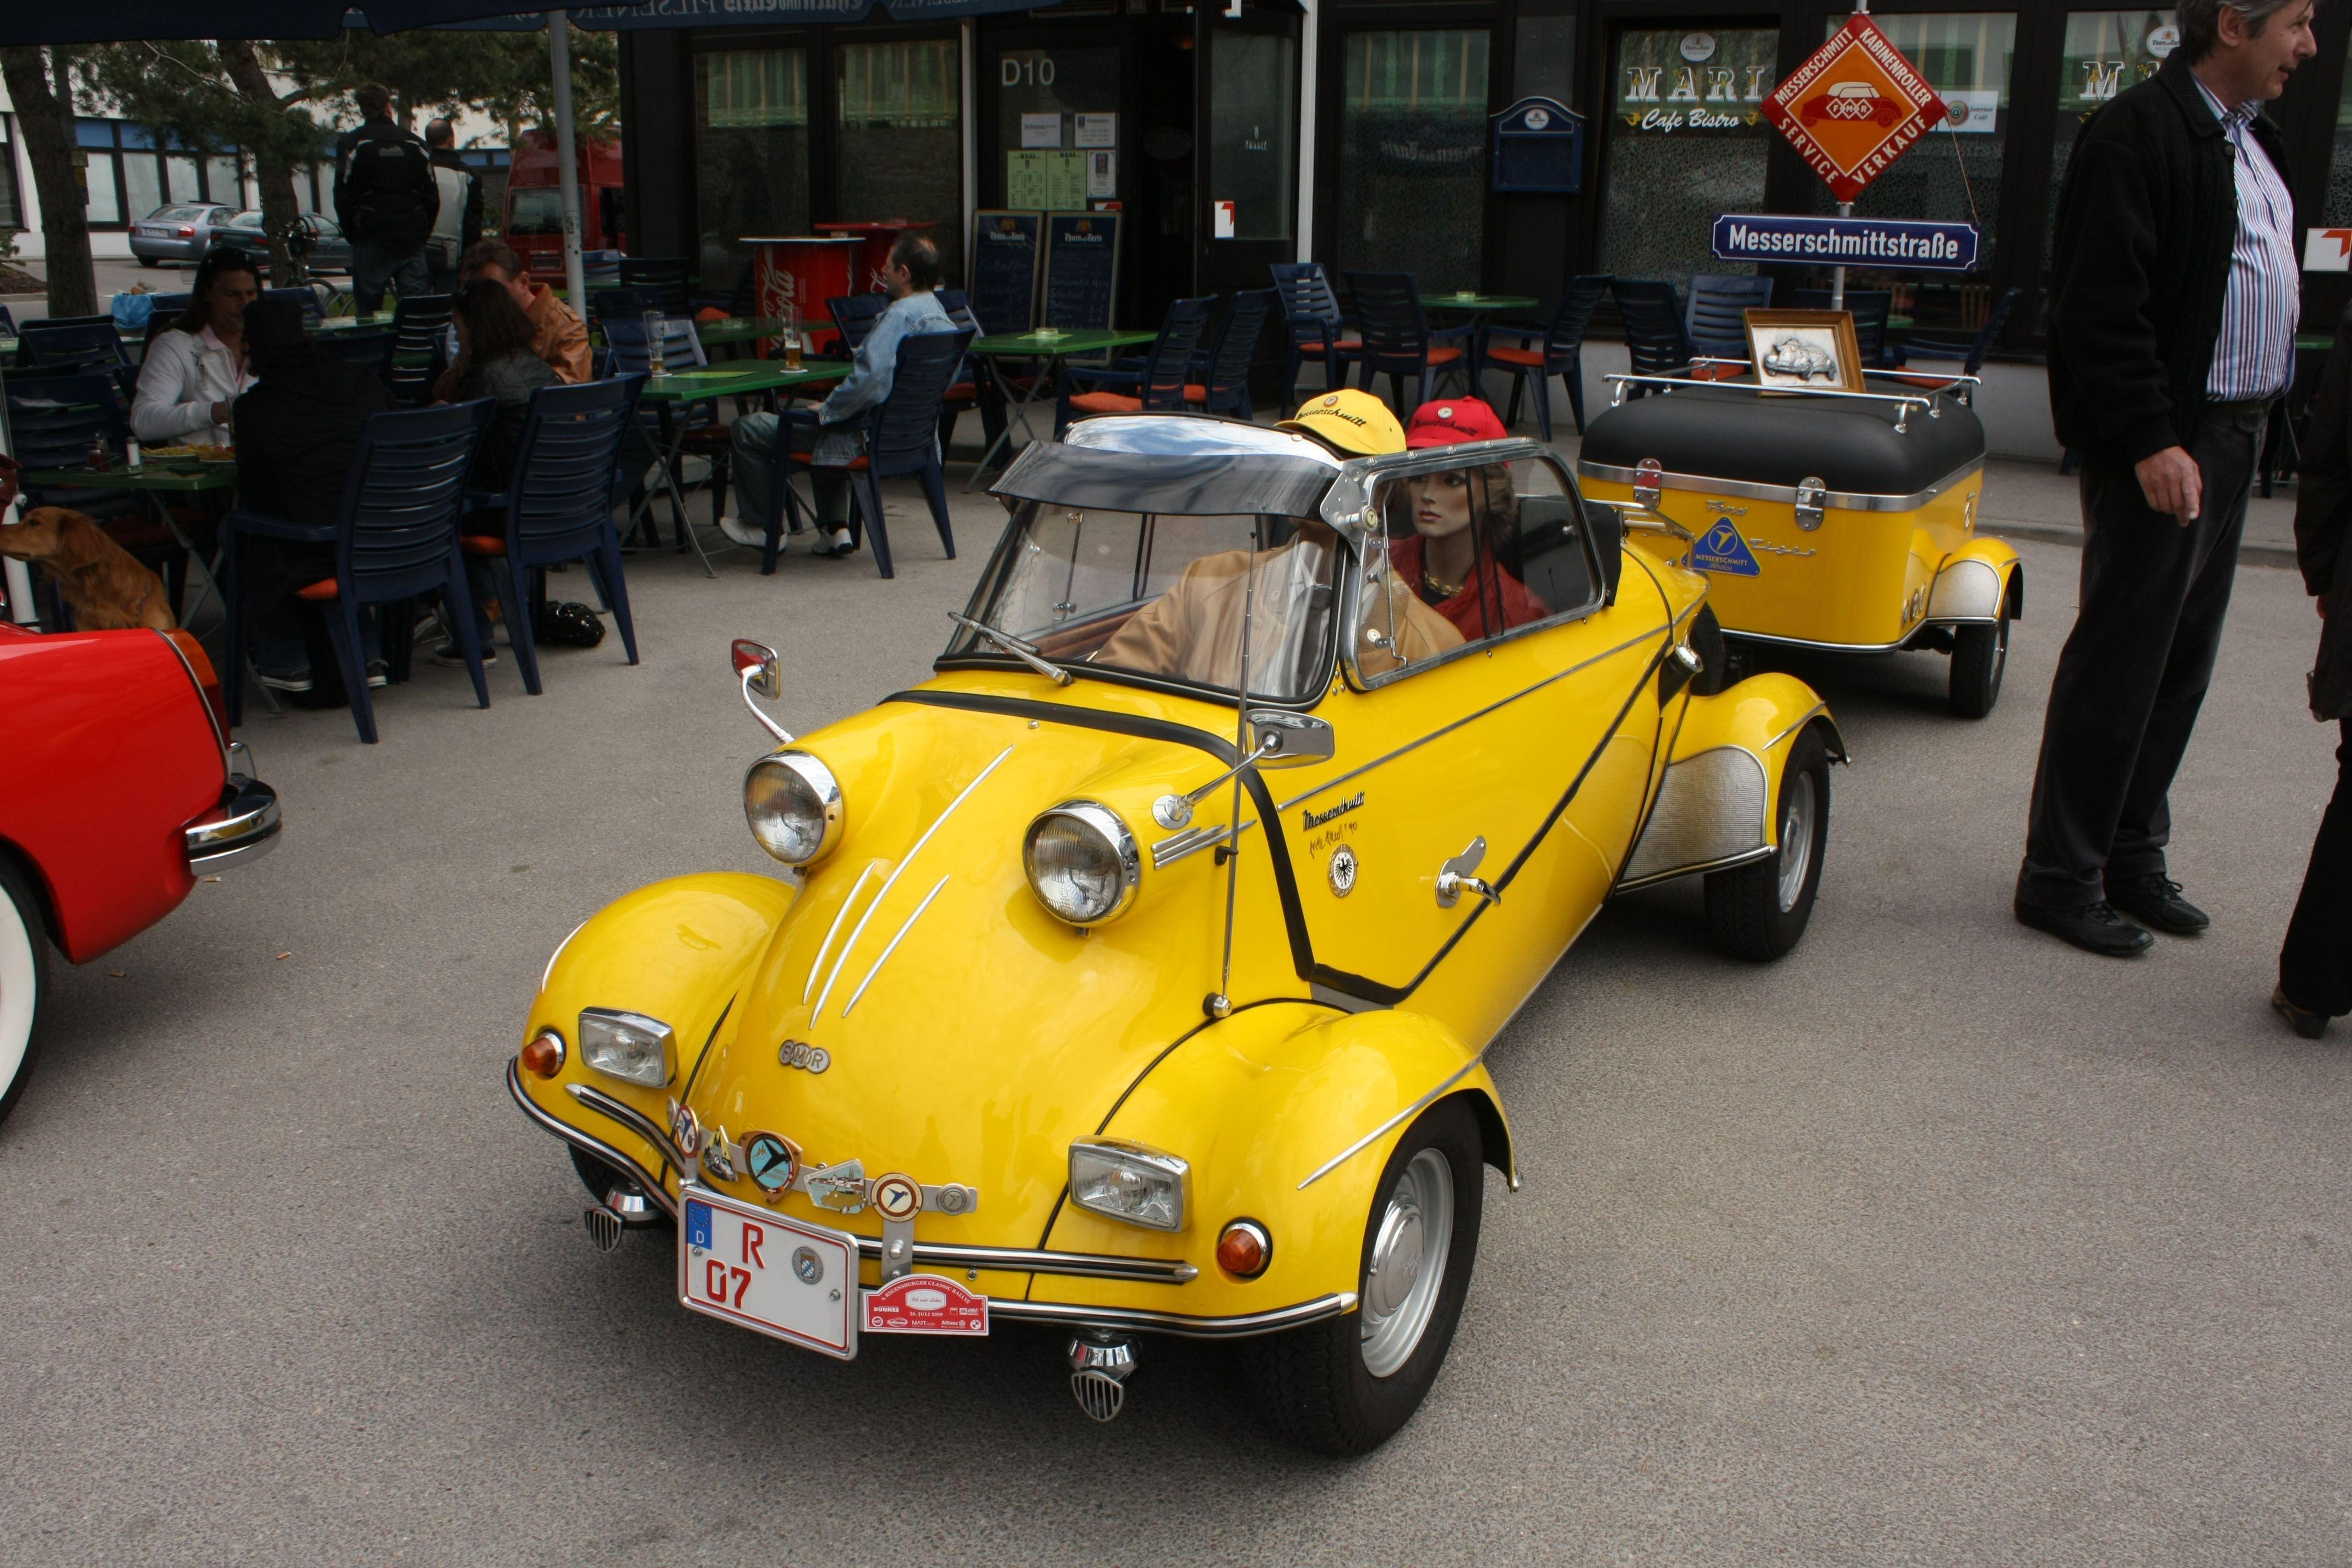 Microcar | You Drive Car Hire - www.you-drive.cc - Faro Car Hire | Faro airport Car Hire | Portugal Car Hire | Algarve Car Hire